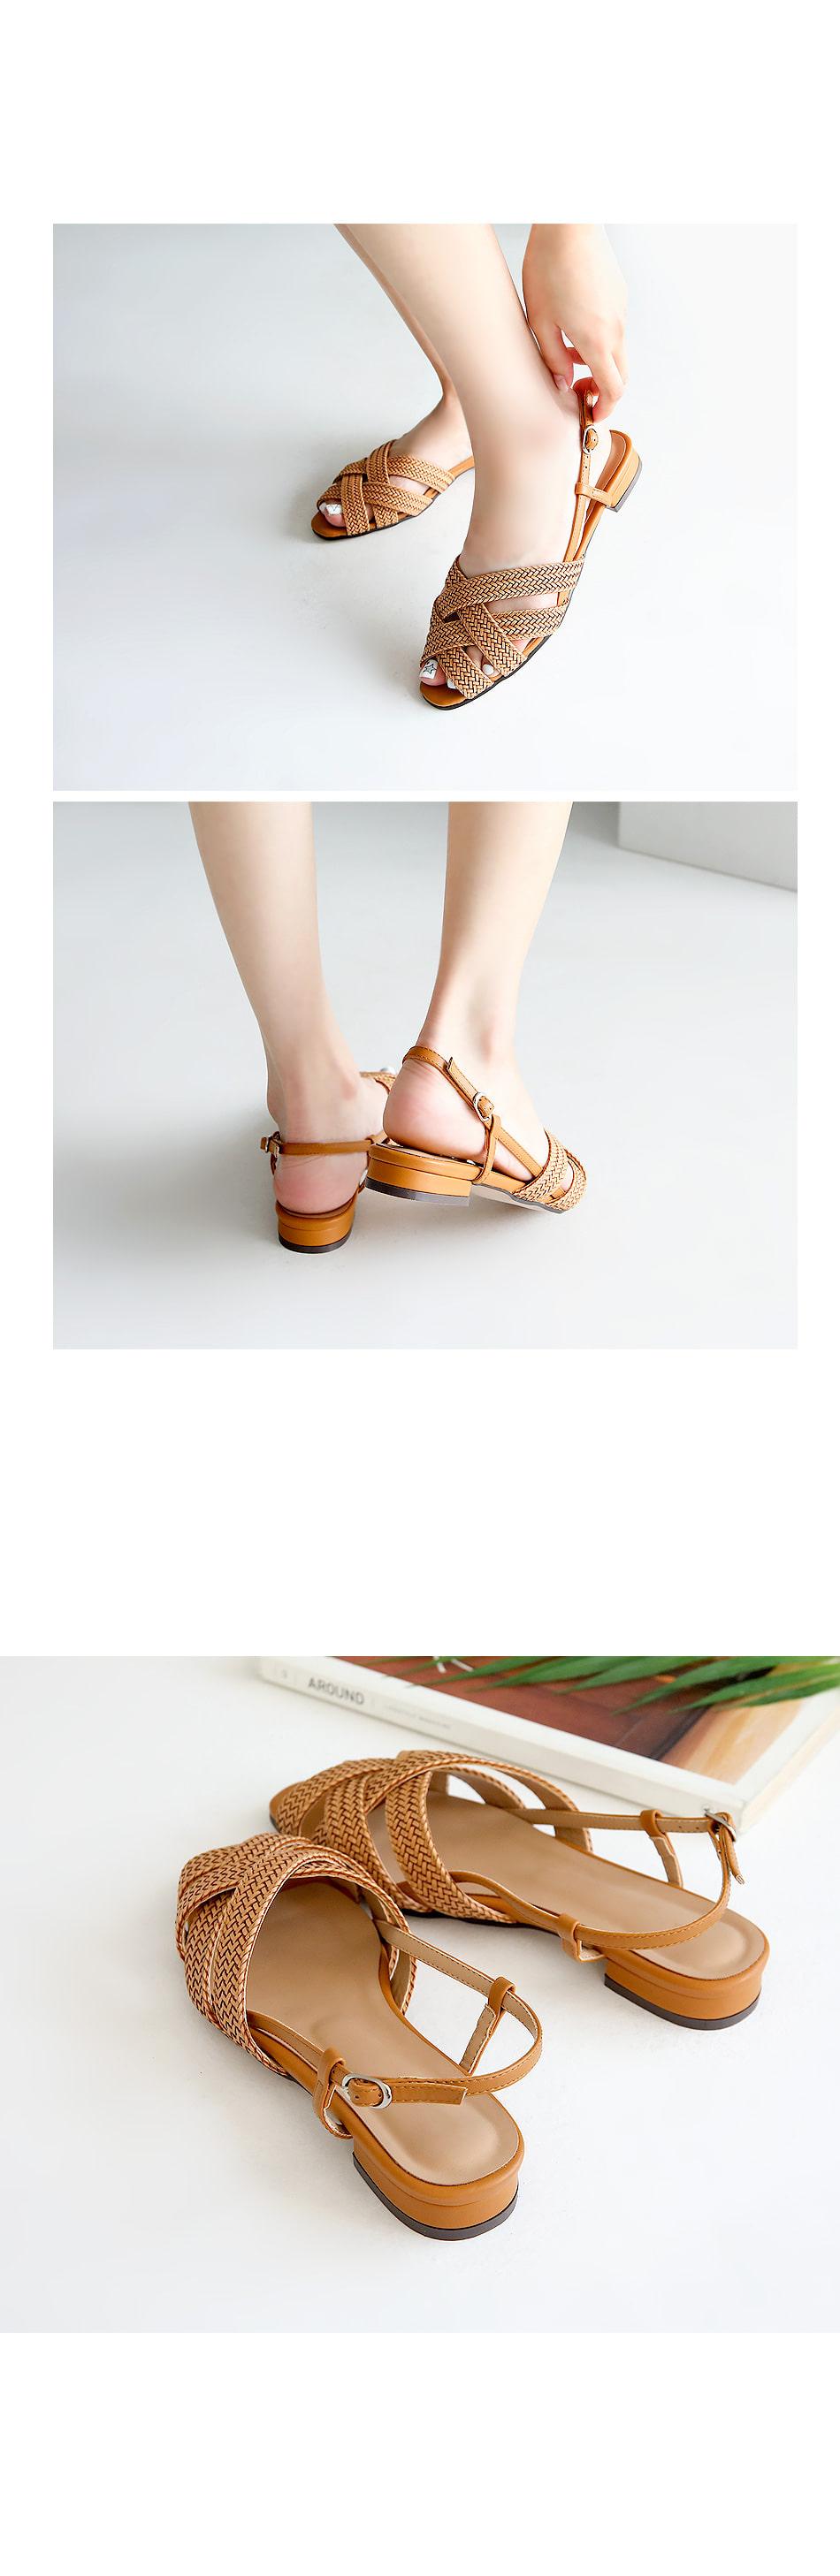 Repecan Sling Back Sandals 2cm